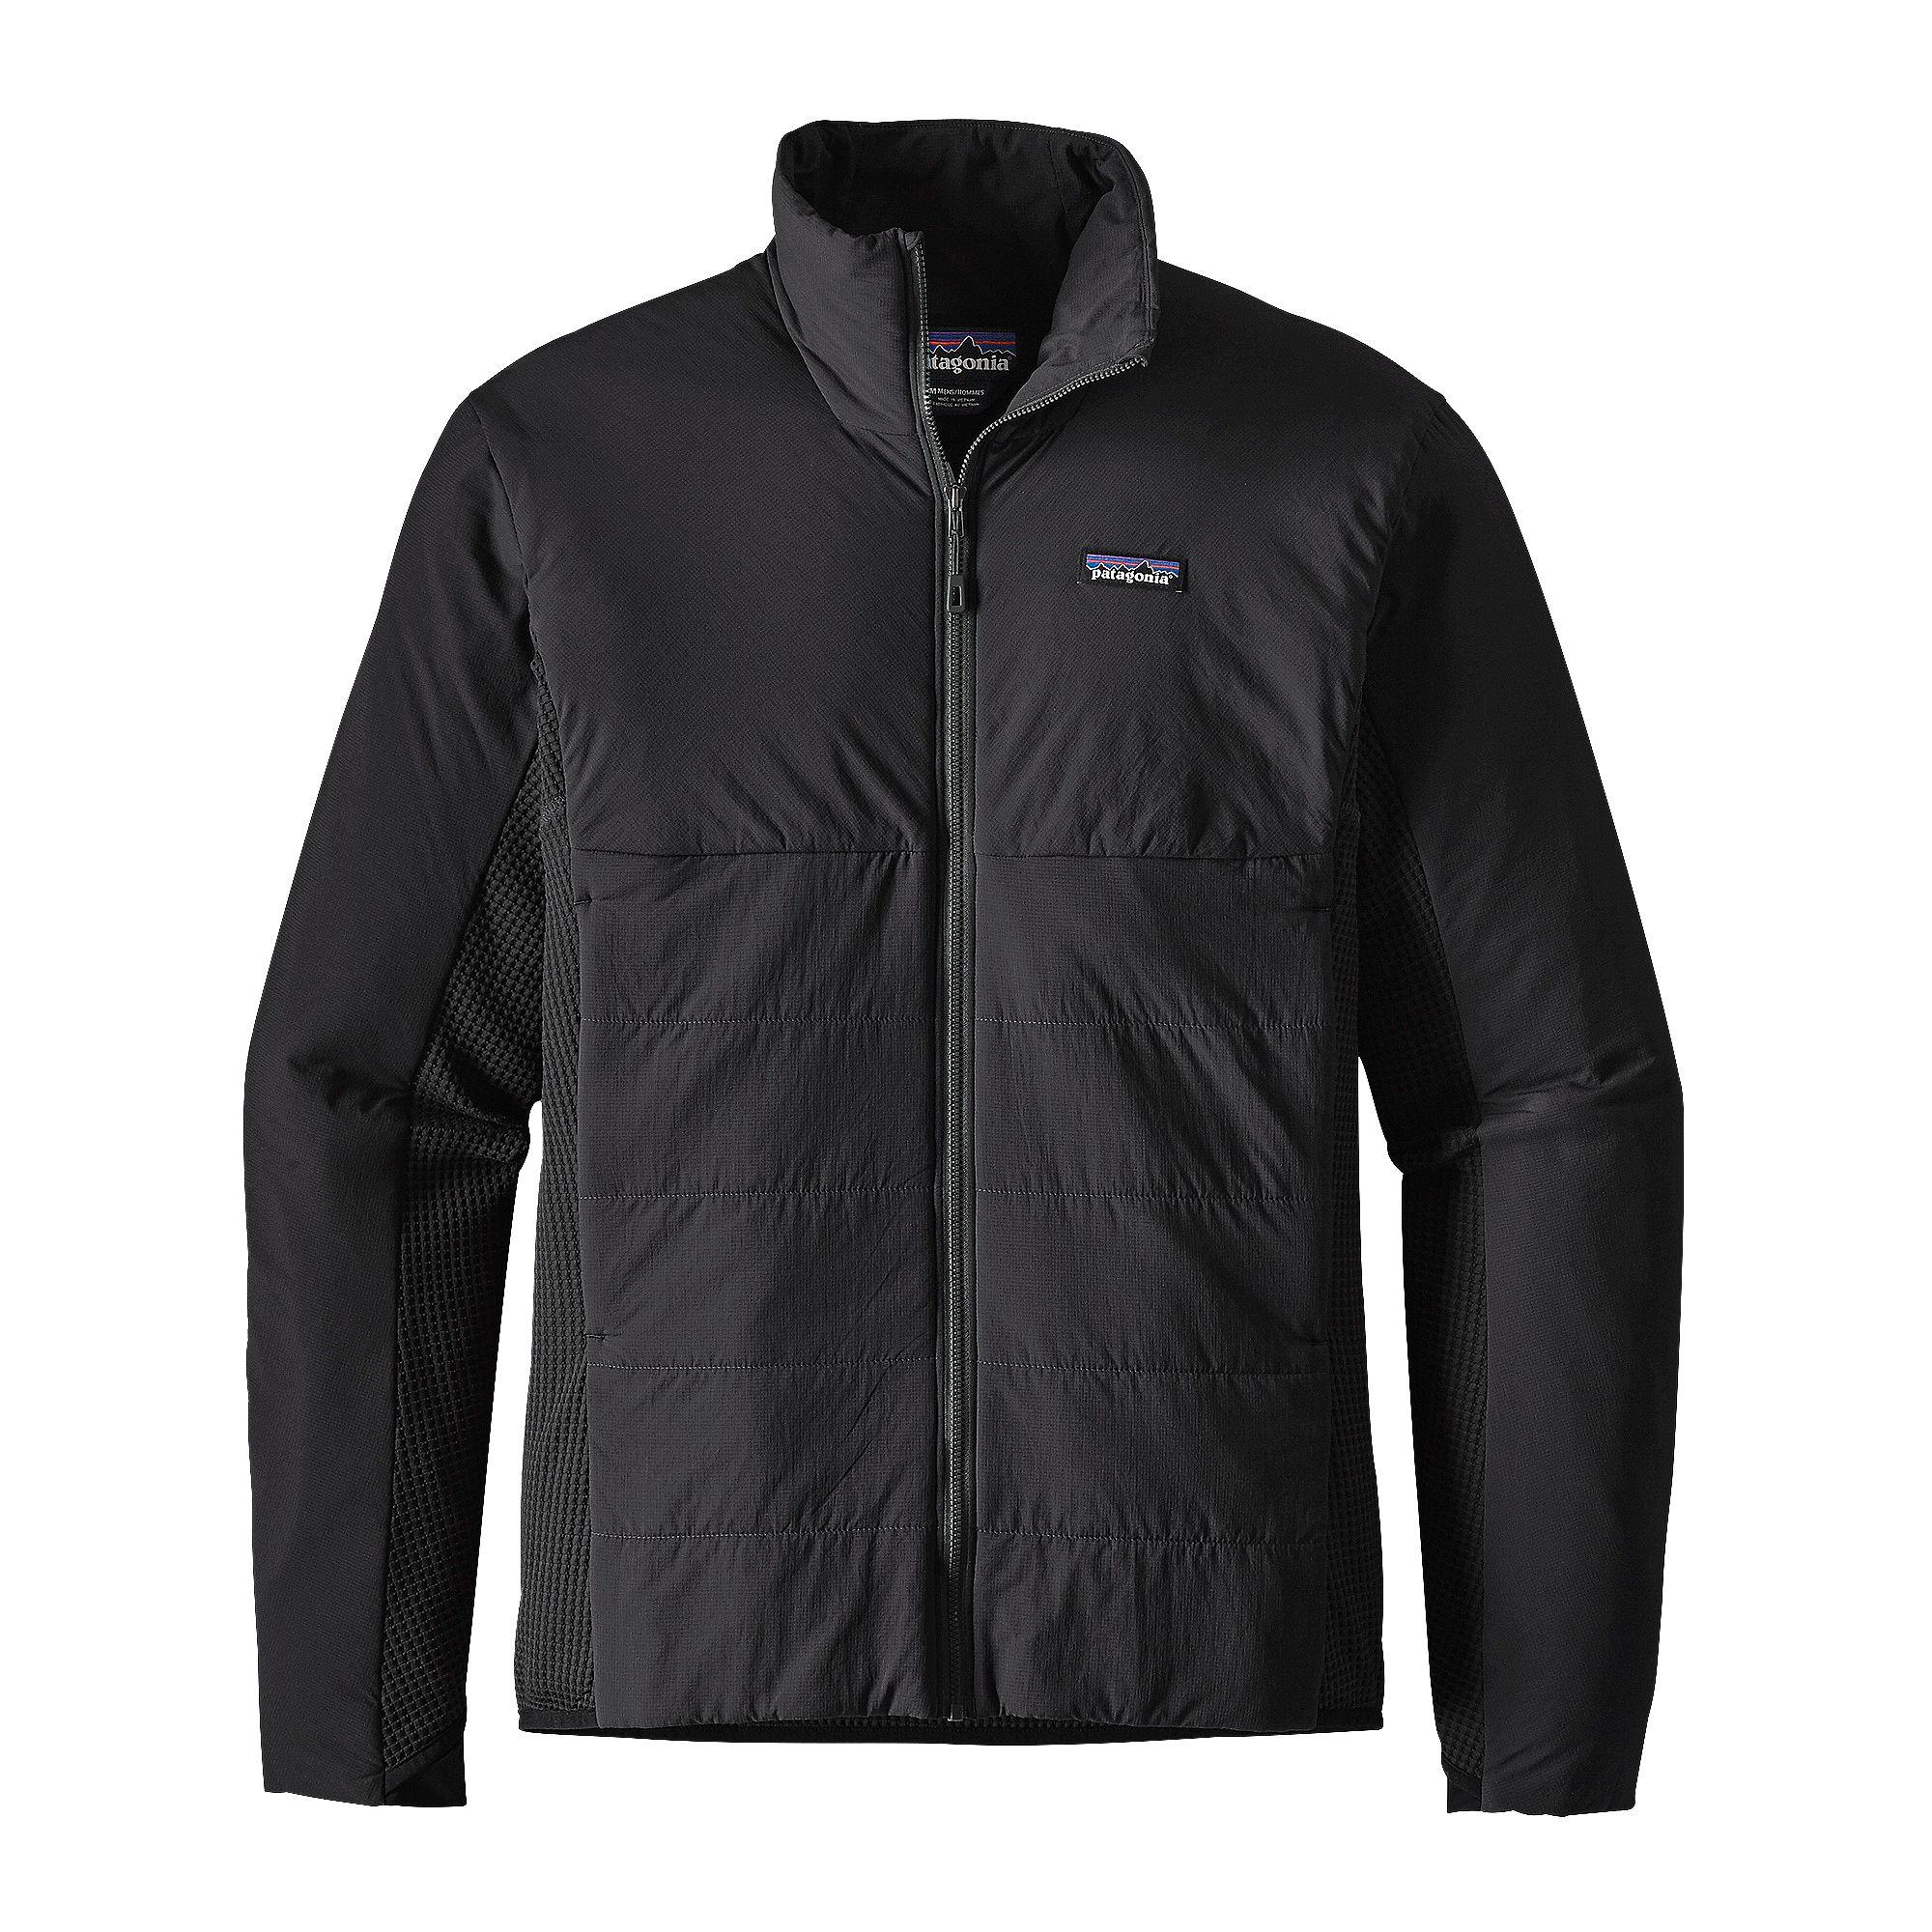 Patagonia - Nano-Air Light Hybrid Jacket - Softshell jacket - Men's